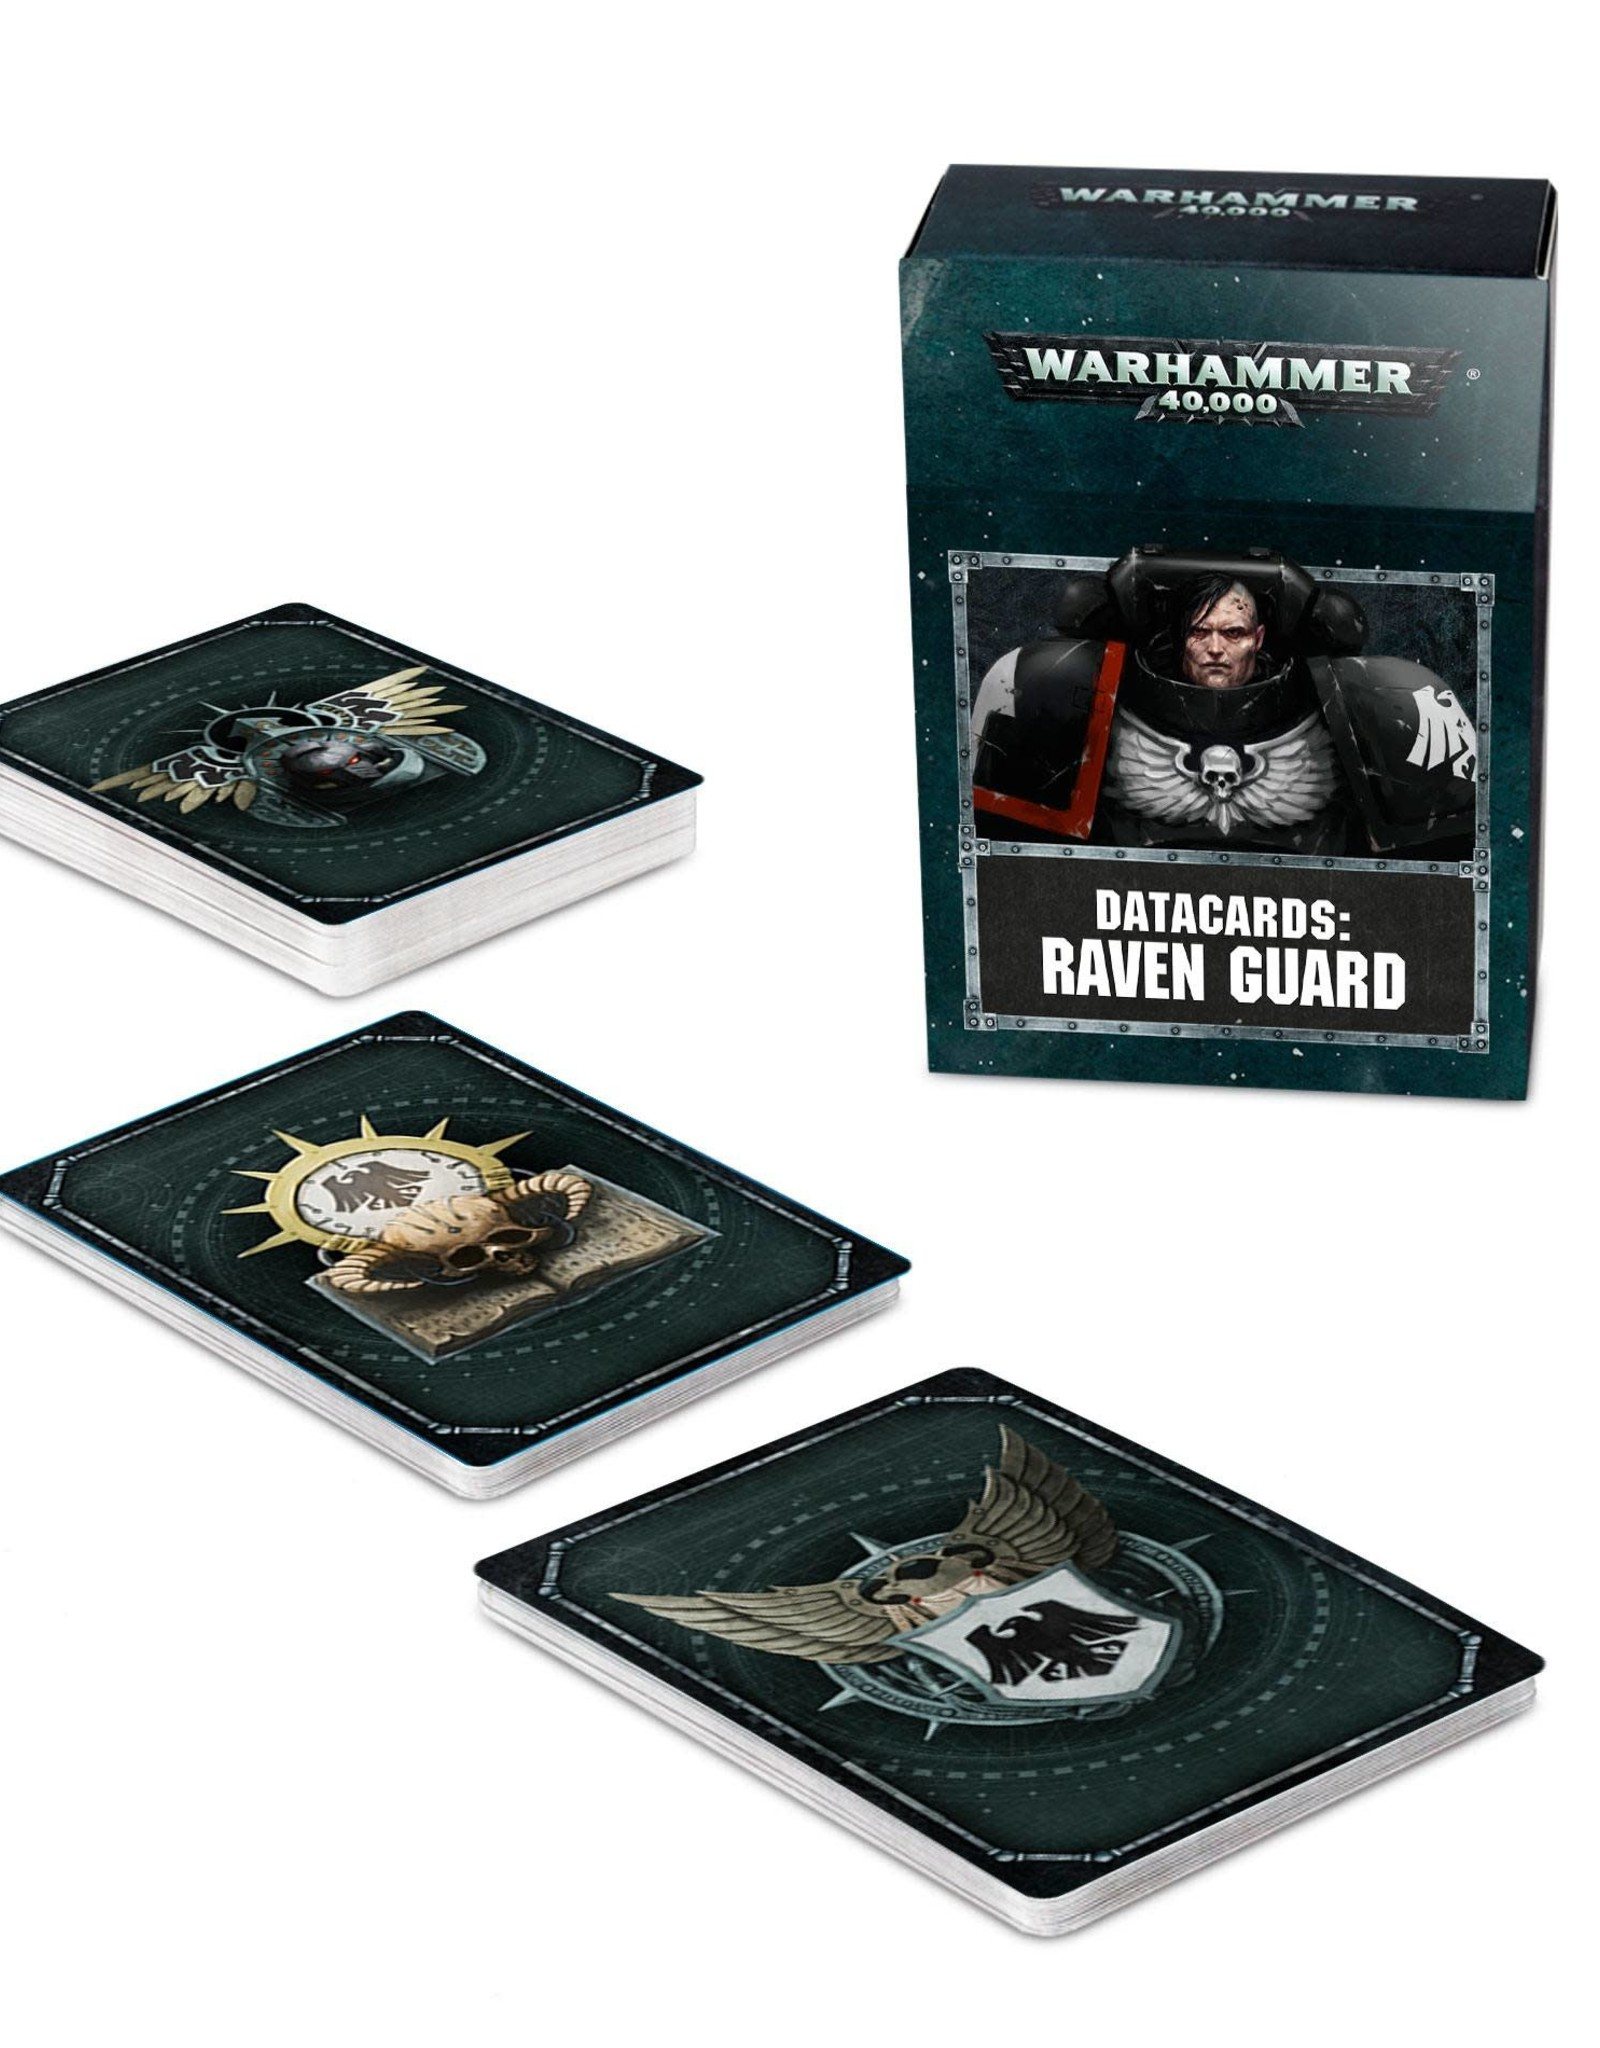 Warhammer 40K Datacards: Raven Guard